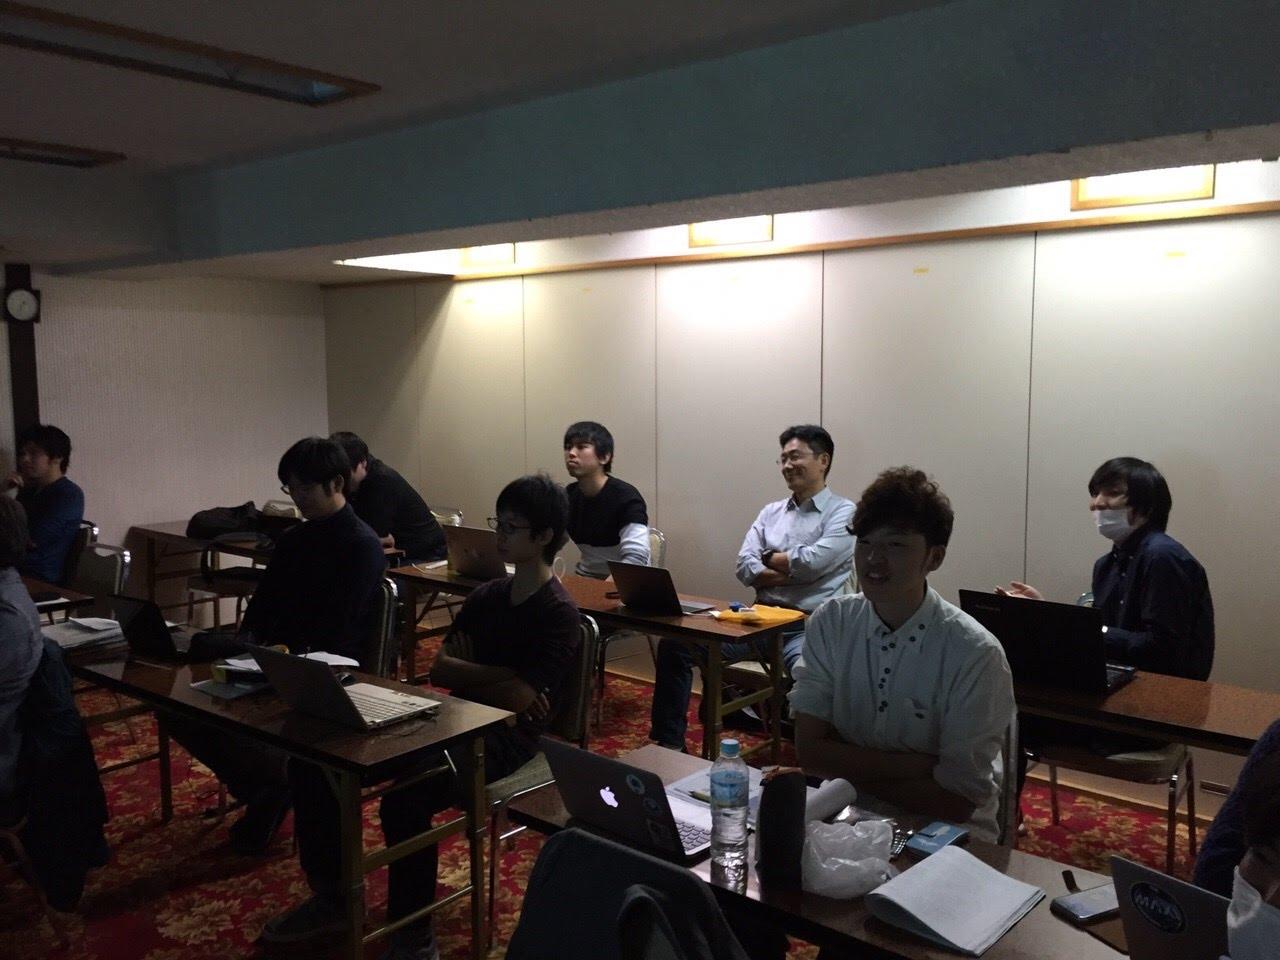 https://4310b1a9-a-c2f1267d-s-sites.googlegroups.com/a/yoshida-agu.net/home/dairy-of-yoshida-lab/20151178/happyou3.JPG?attachauth=ANoY7coBaq4KO_rbB-k6ZFG8iXMOrmEc2kDvP1So-Sw9hSqJ8pu_mKtAzz9r9oC1iYo-bg-RcLq0Qw8xNERFOyAh983gCiS9sBJ_NTg8a8SG9pm4VT4VisHOvSpv2bUrGUOjgXNdLasqdWZA7CwUZu_40TMdjh0xC8PfPjf5vqfY0RCgBBYZ1Xio51xoa5jM_Uv_x3_OY7vIIg_48S8_Jccx4DtSique2oxJxnbdkuKl3D_-DWbgXQTHZ32HZuU5xH5OEdrvmPVq&attredirects=0